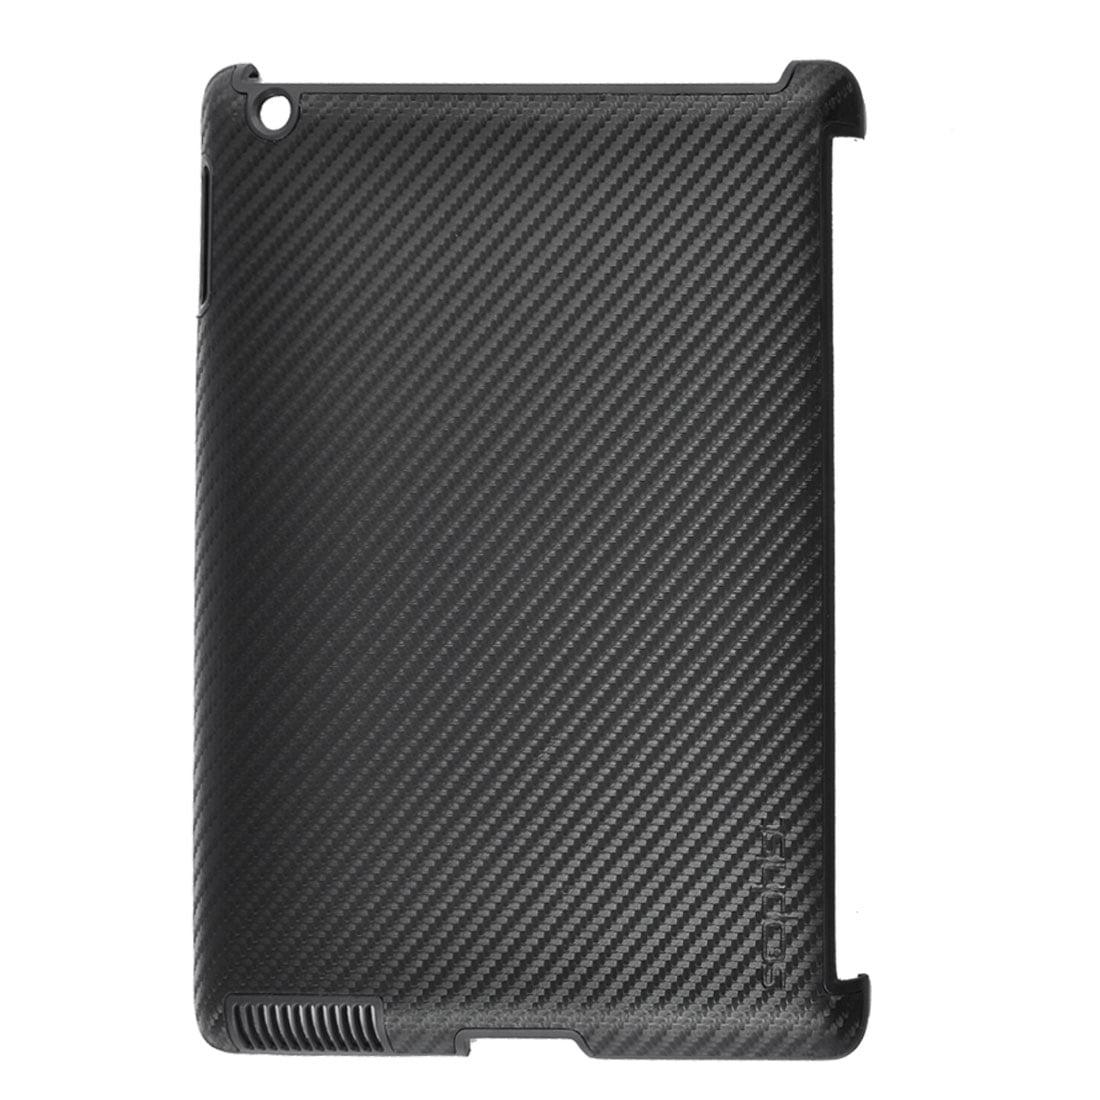 Carbon Fiber Pattern Black Hard Back Cover Case Shell for Apple iPad 2